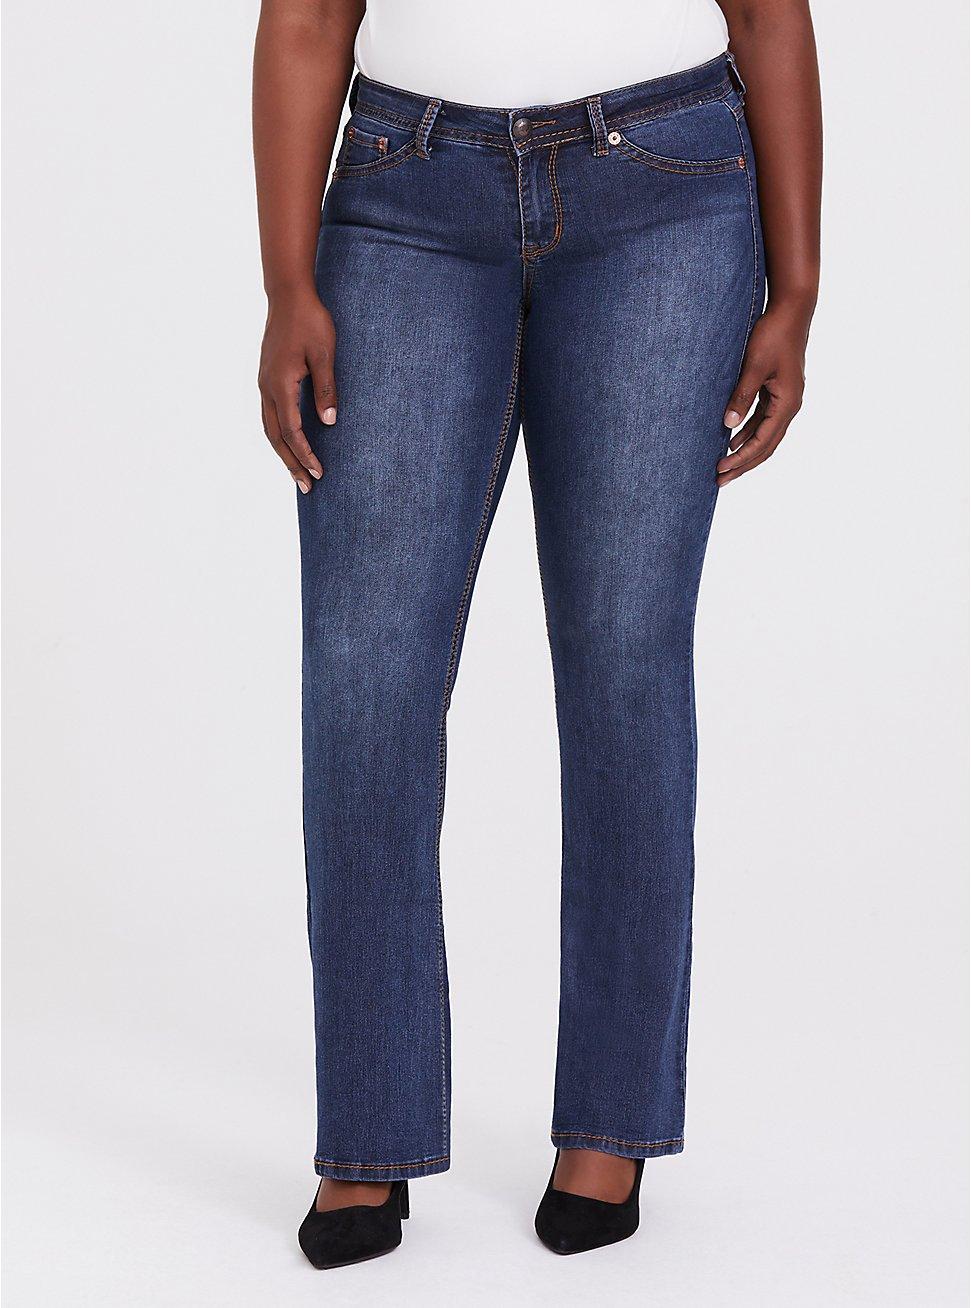 Slim Boot Jean - Medium Wash, , fitModel1-hires